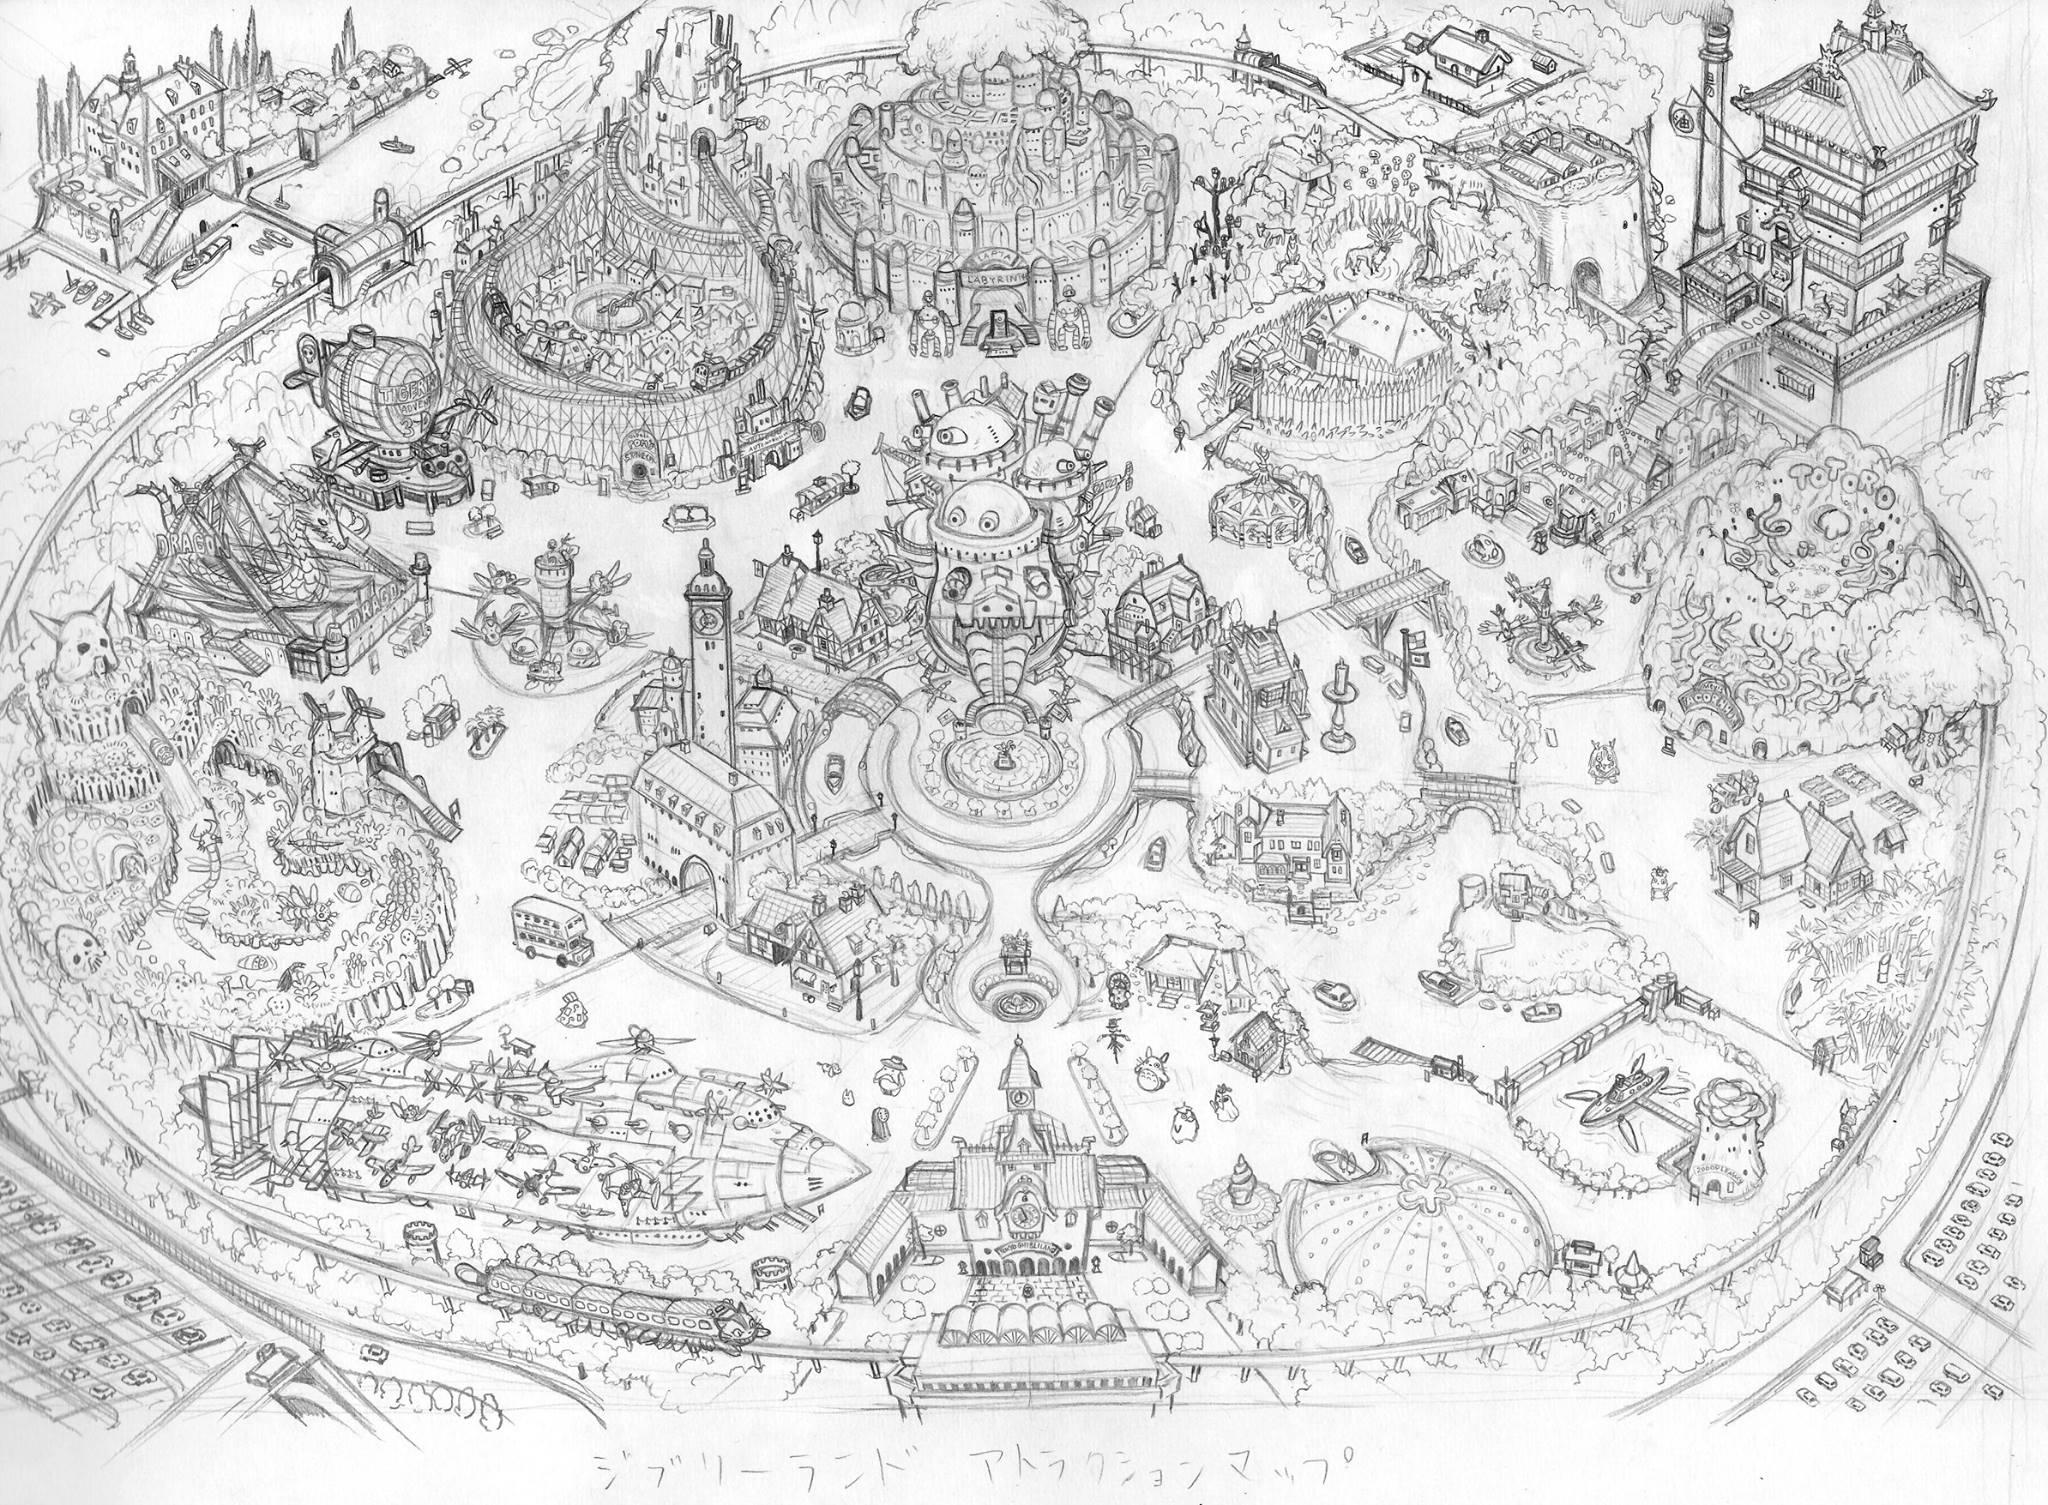 La Ghibli Land Creata Dallillustratore Giapponese Takumi